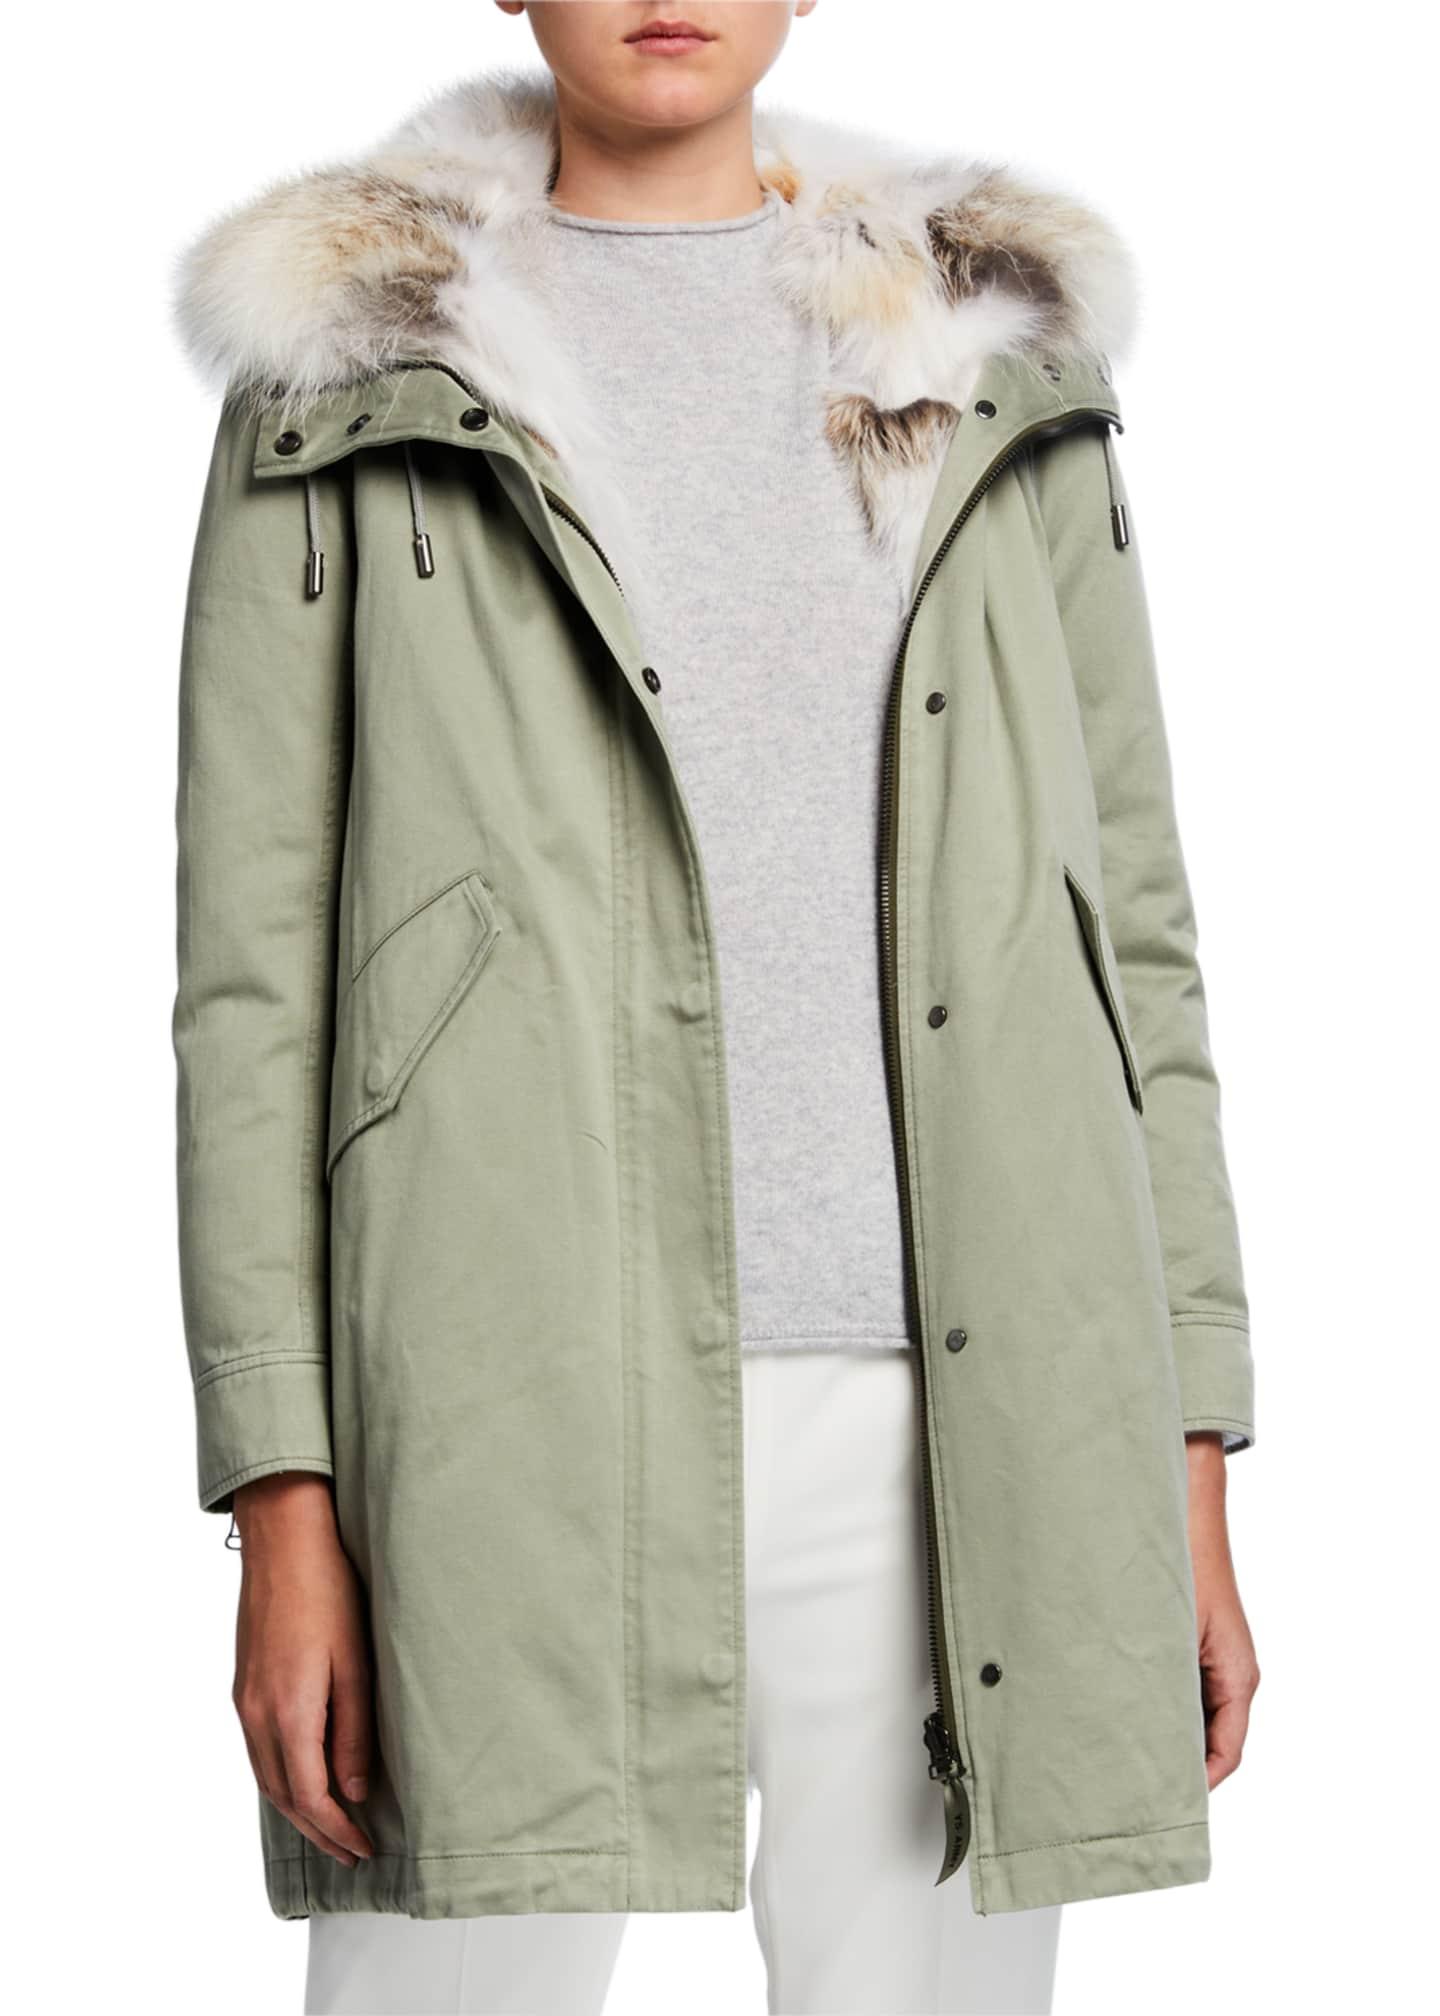 Army By Yves Salomon Detachable Fur-Trim Hooded Cotton